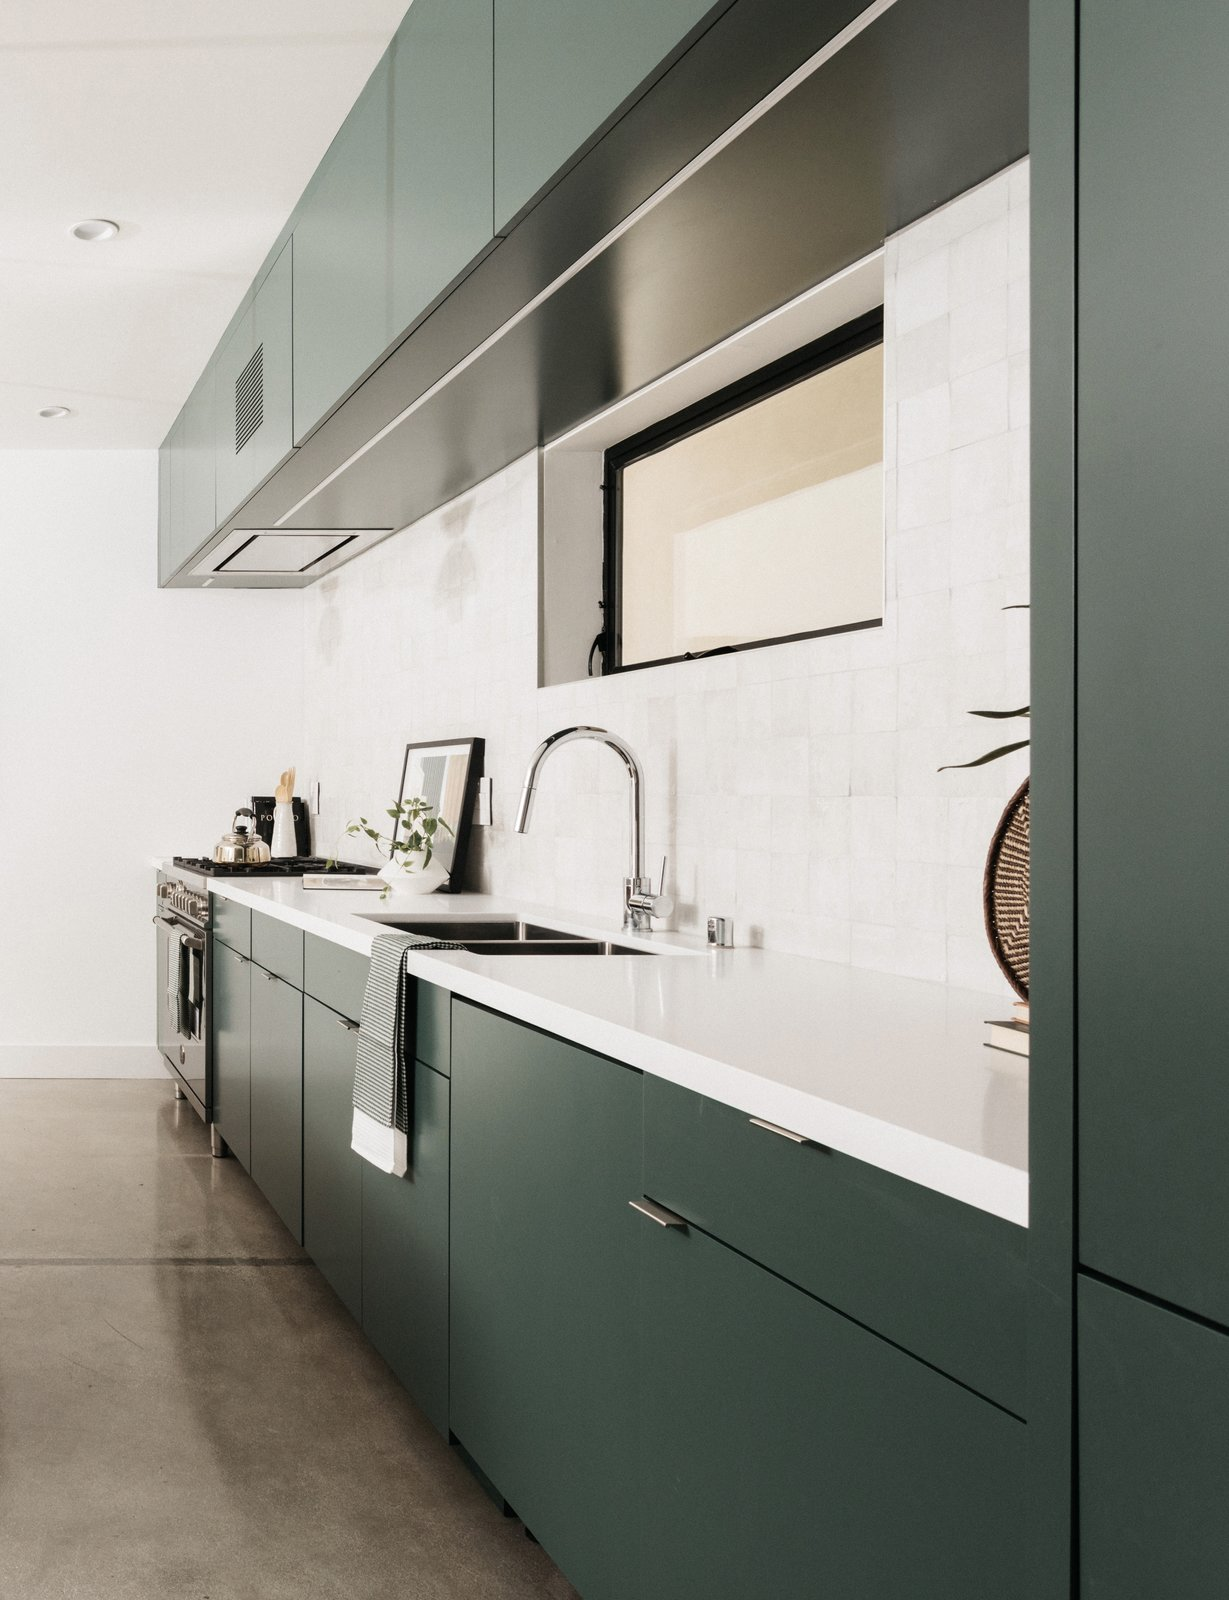 Kitchen, Ceramic Tile, Refrigerator, Cooktops, Concrete, Undermount, Engineered Quartz, Range, Colorful, and Recessed Kitchen  Best Kitchen Concrete Undermount Refrigerator Engineered Quartz Photos from Echo House